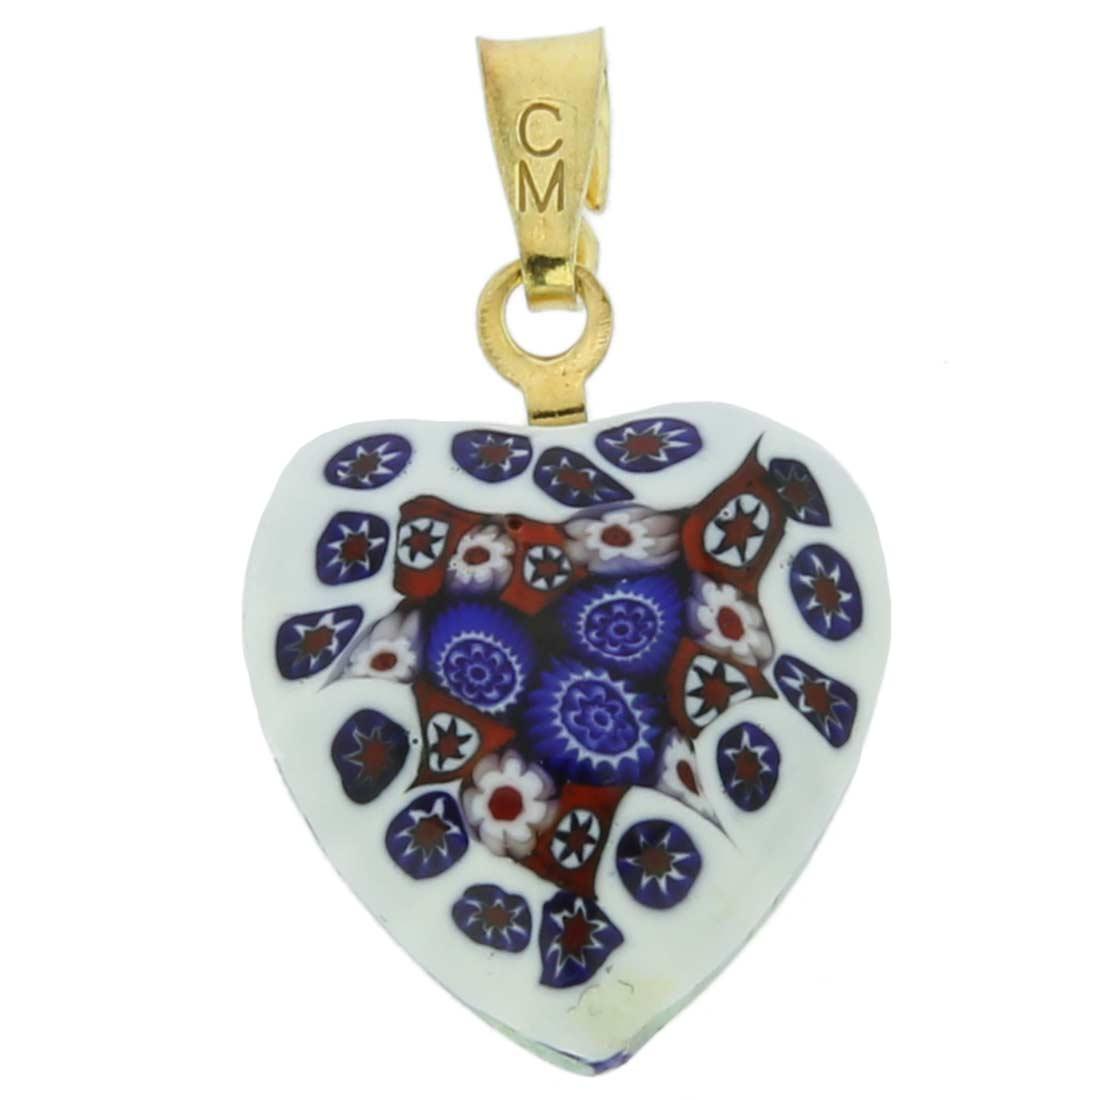 Millefiori heart pendant - gold #7